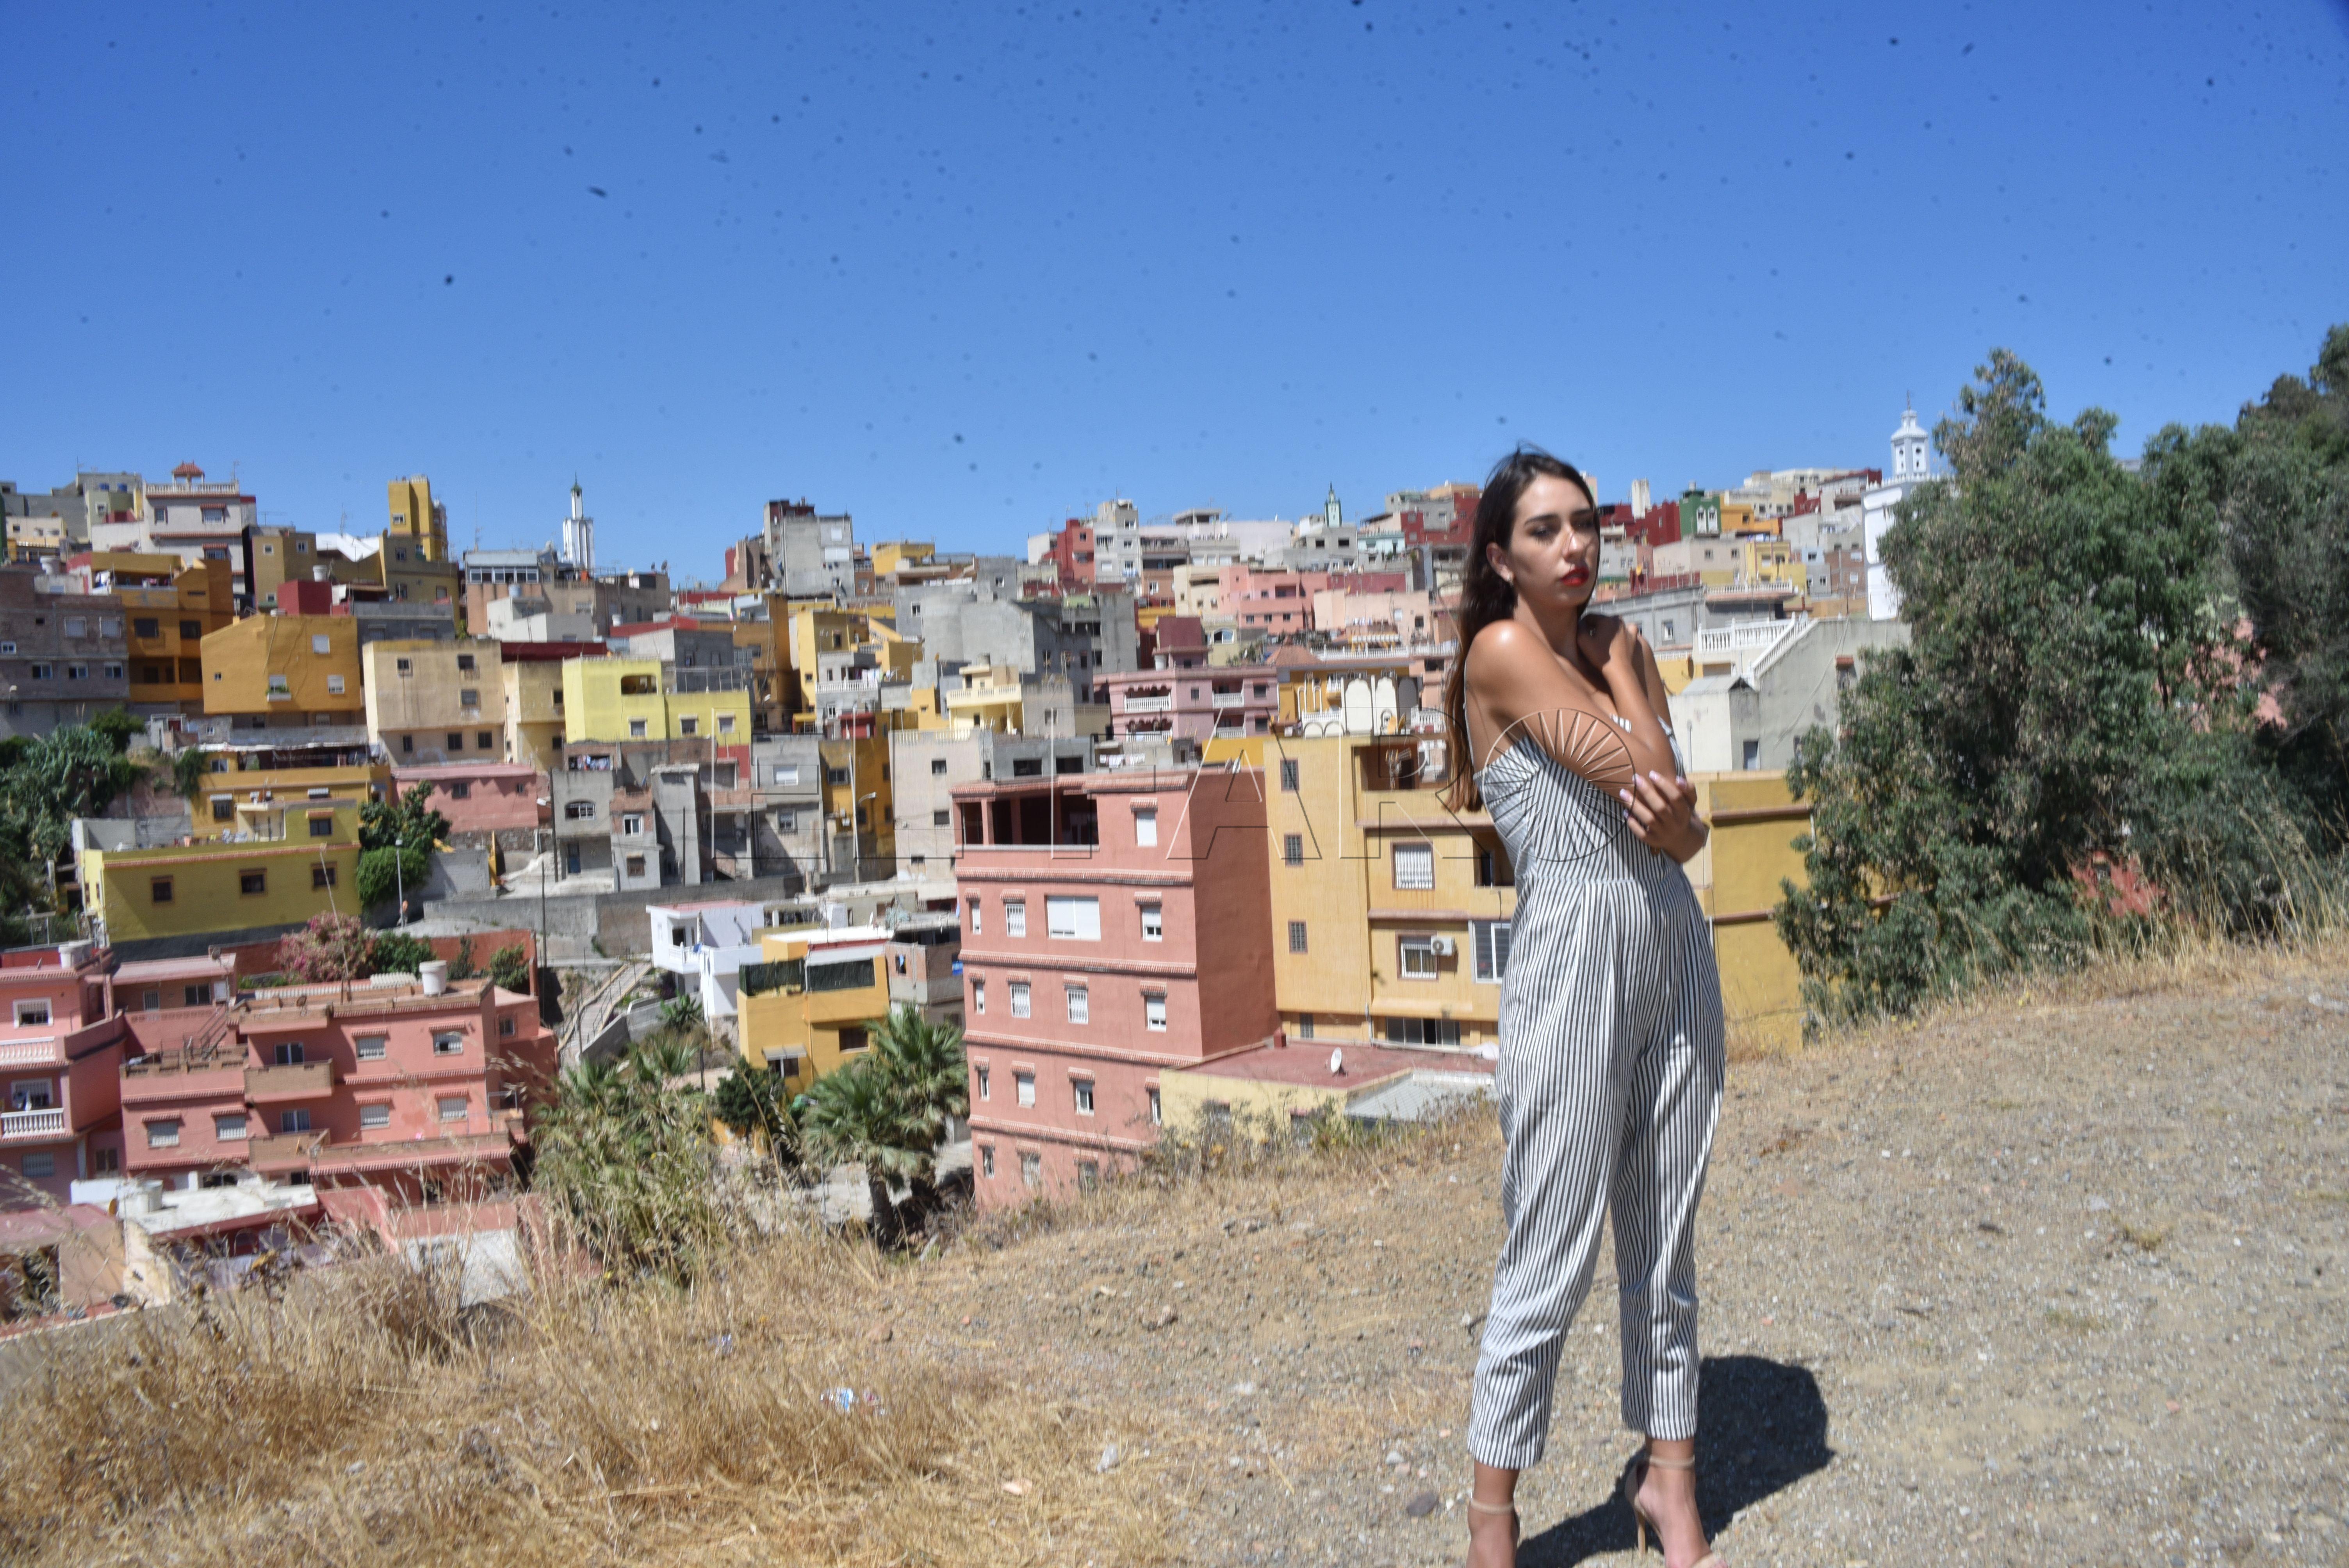 Feminista, futura guardia civil y modelo: Sara Martínez, la candidata ceutí a Miss Mundo 2019 1sLKkX